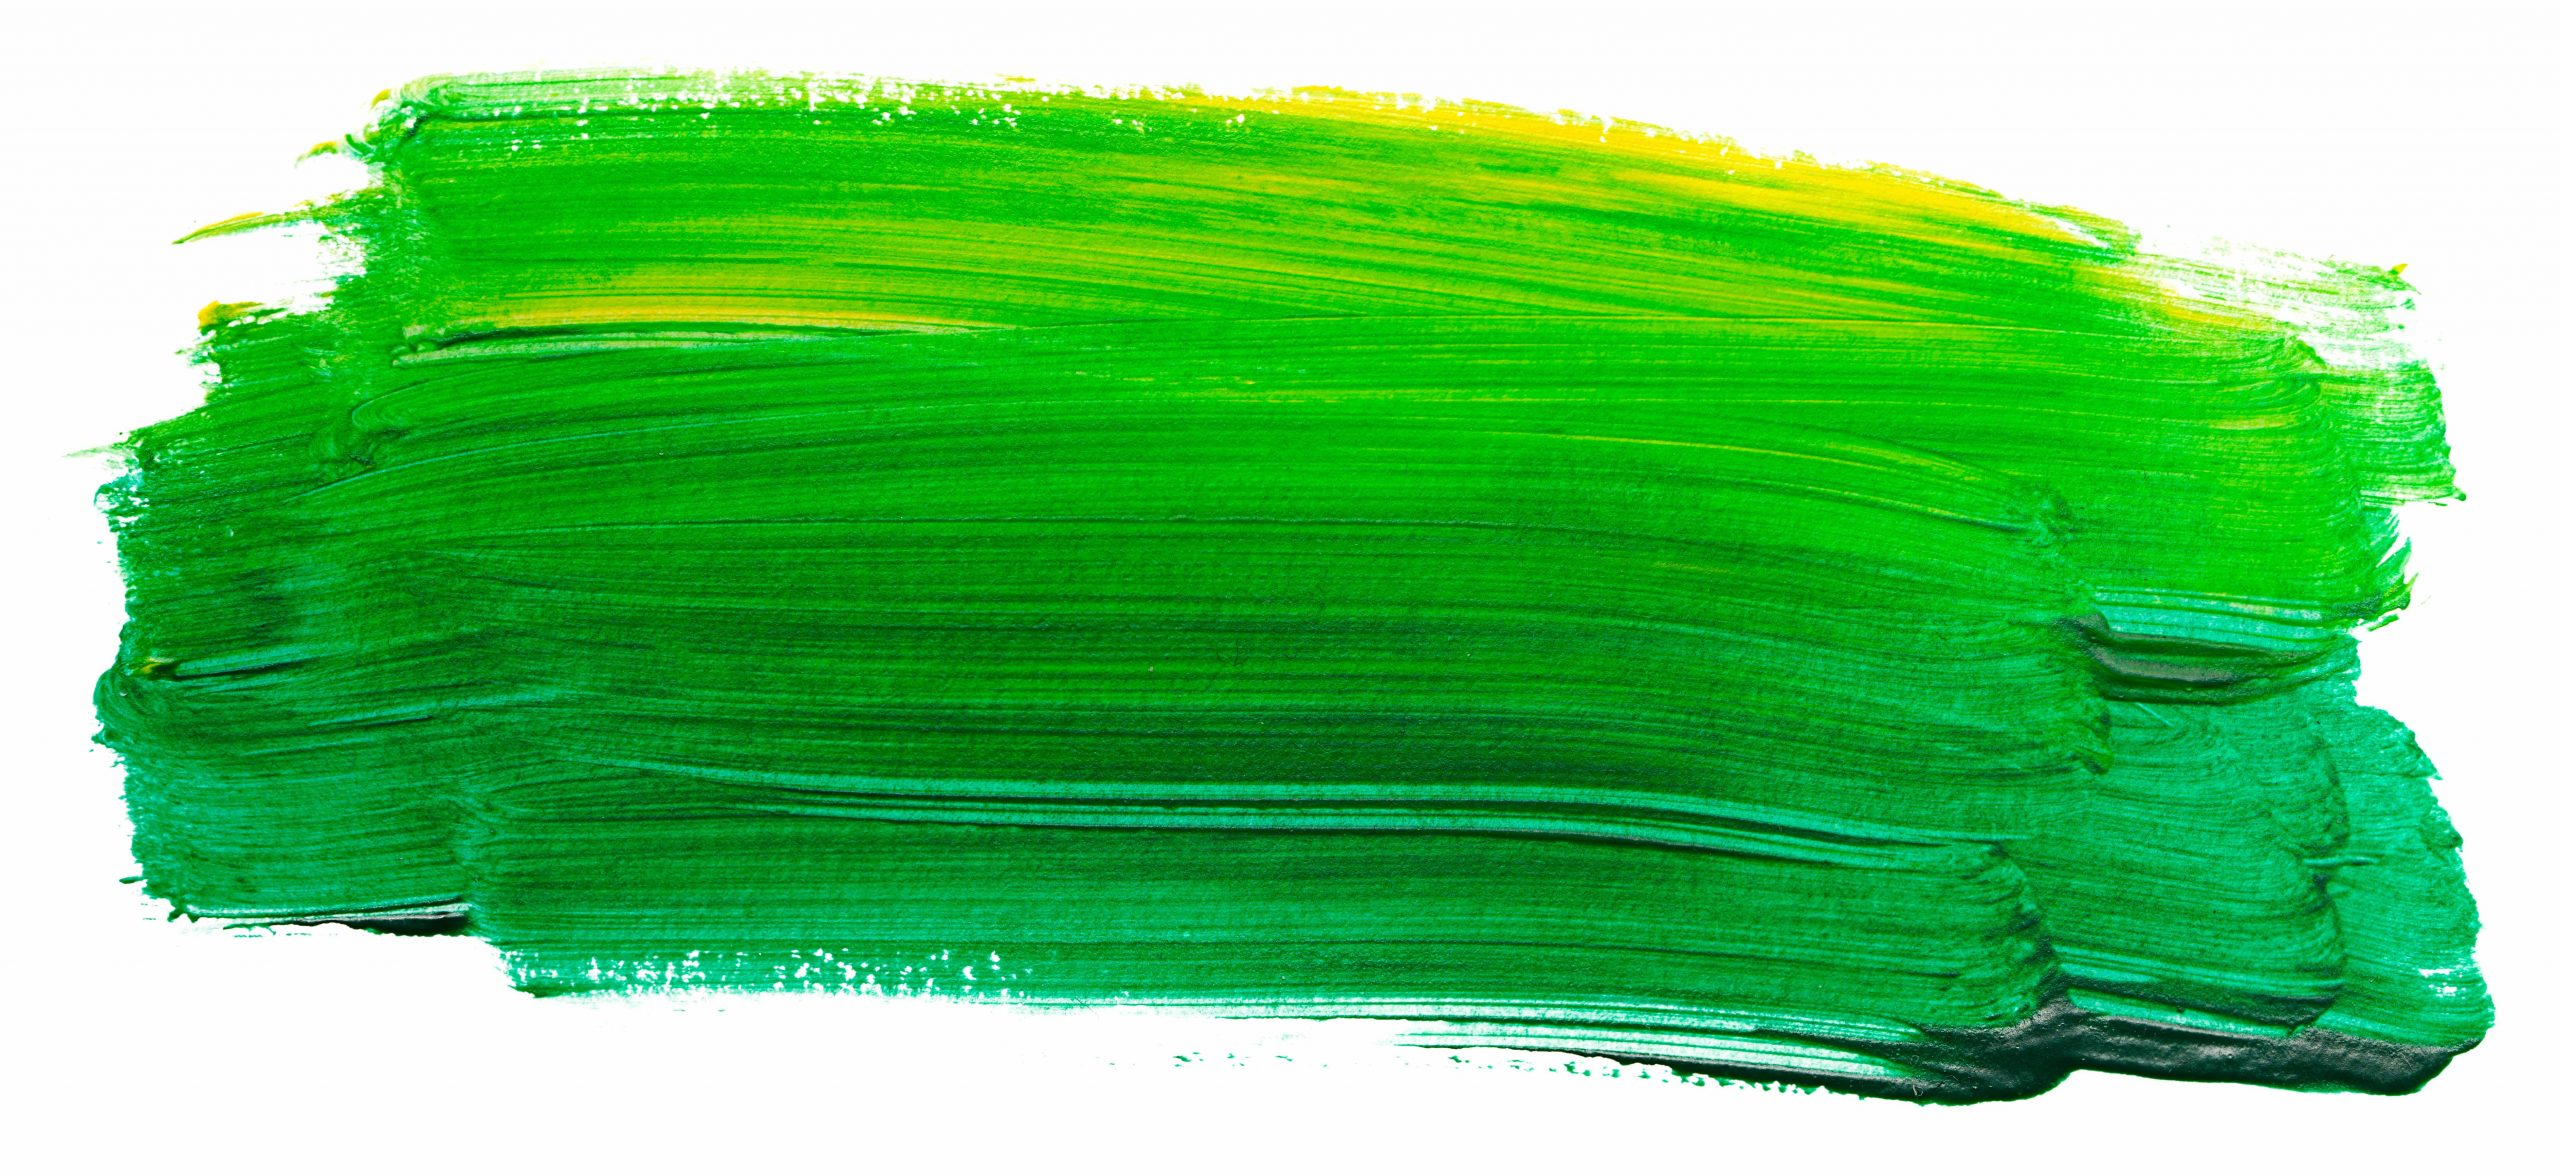 PuttBANDIT | Visibly Better Putting | Green paint brush strokes on white background